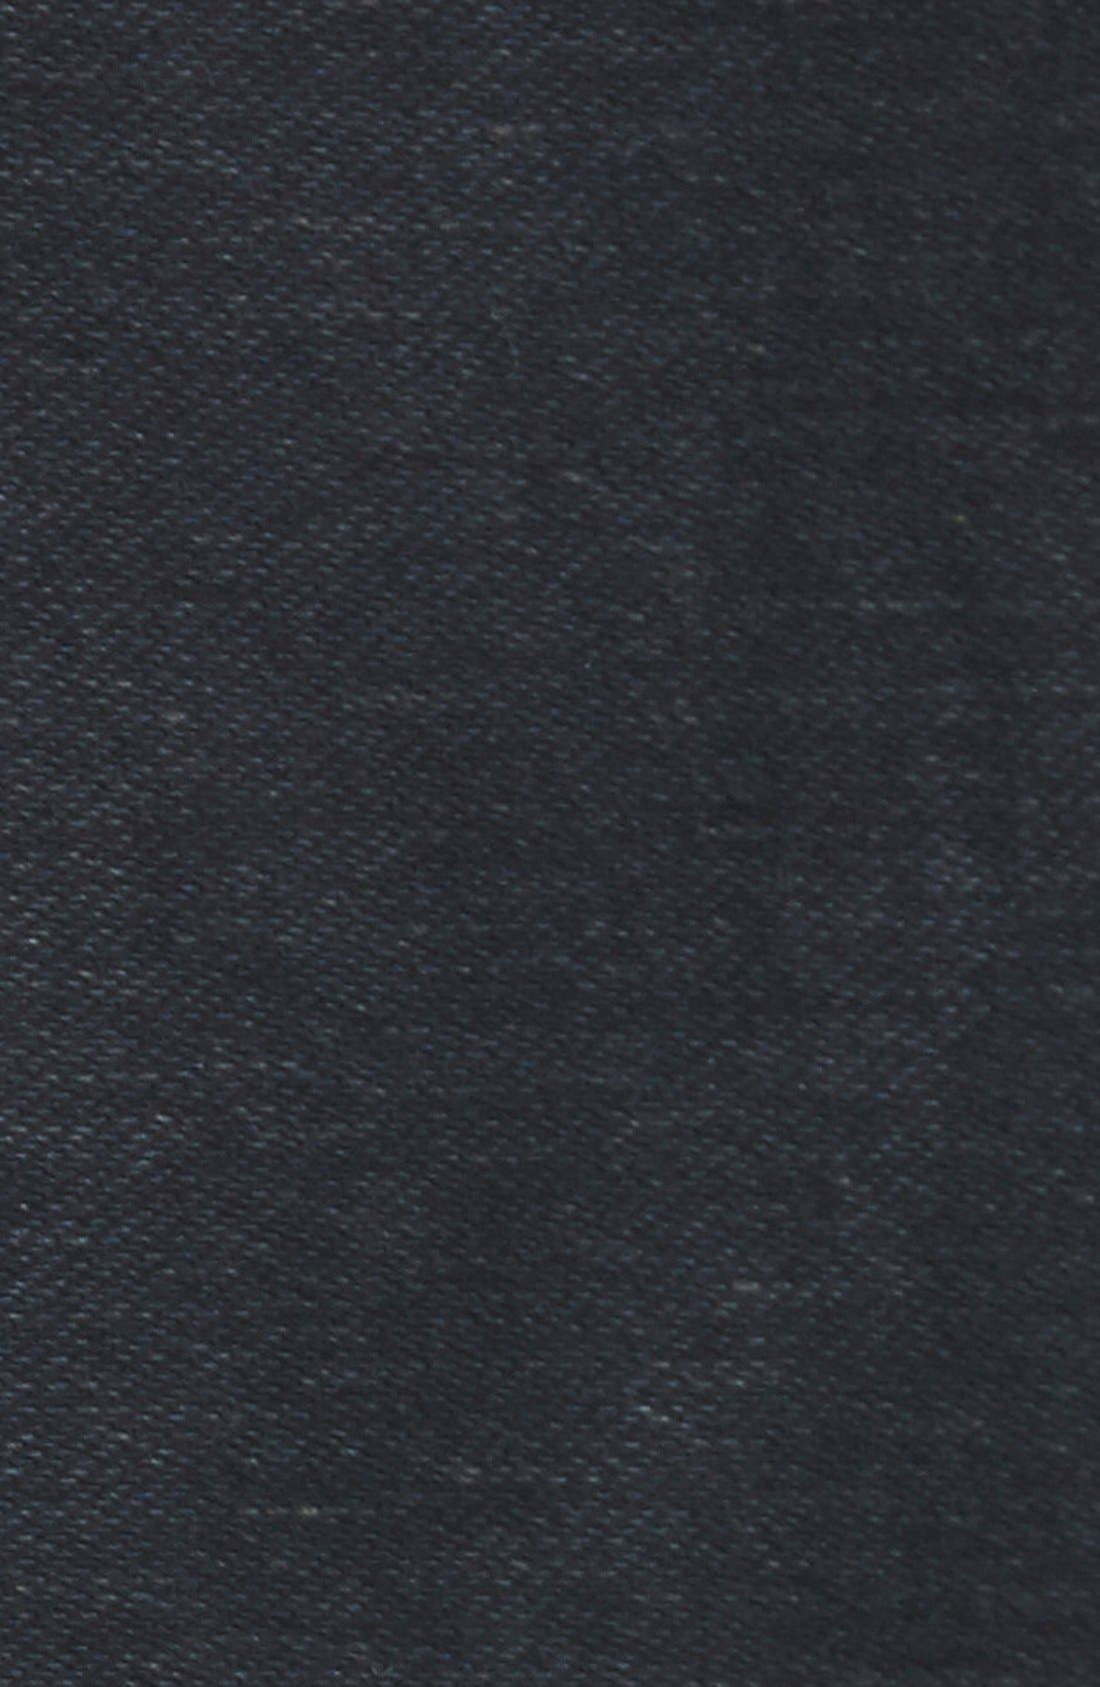 Alternate Image 3  - NIC+ZOE Knit Denim Moto Jacket